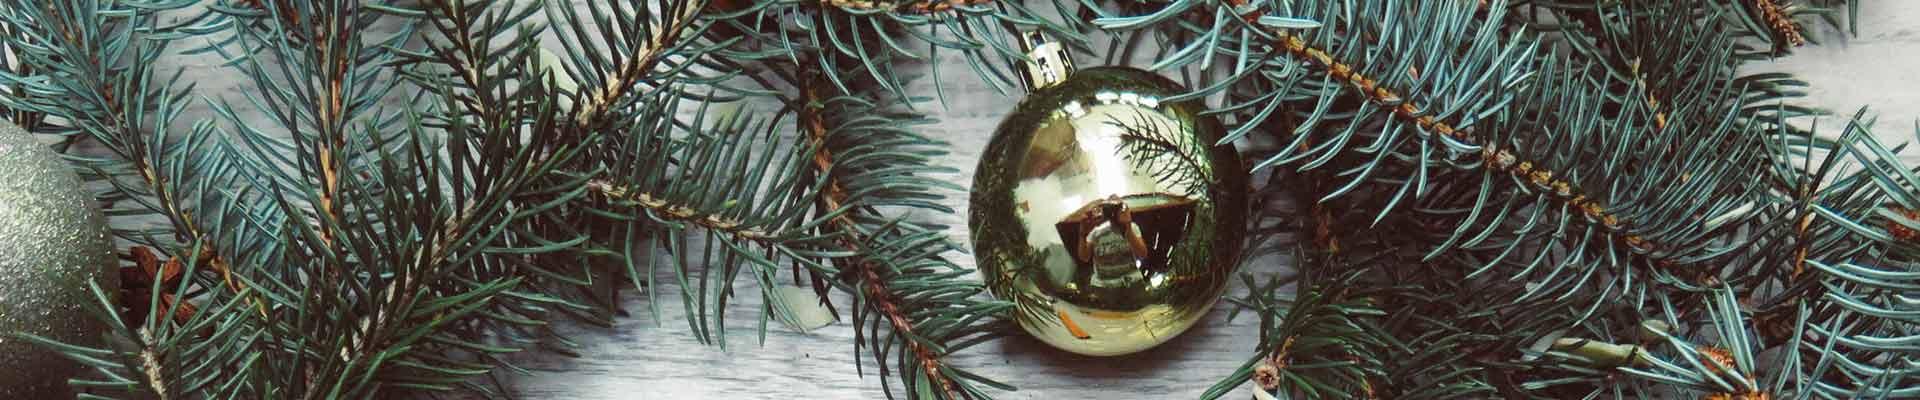 christmas menu - 3 Peaks Bistro - Menu, Events & Times alt